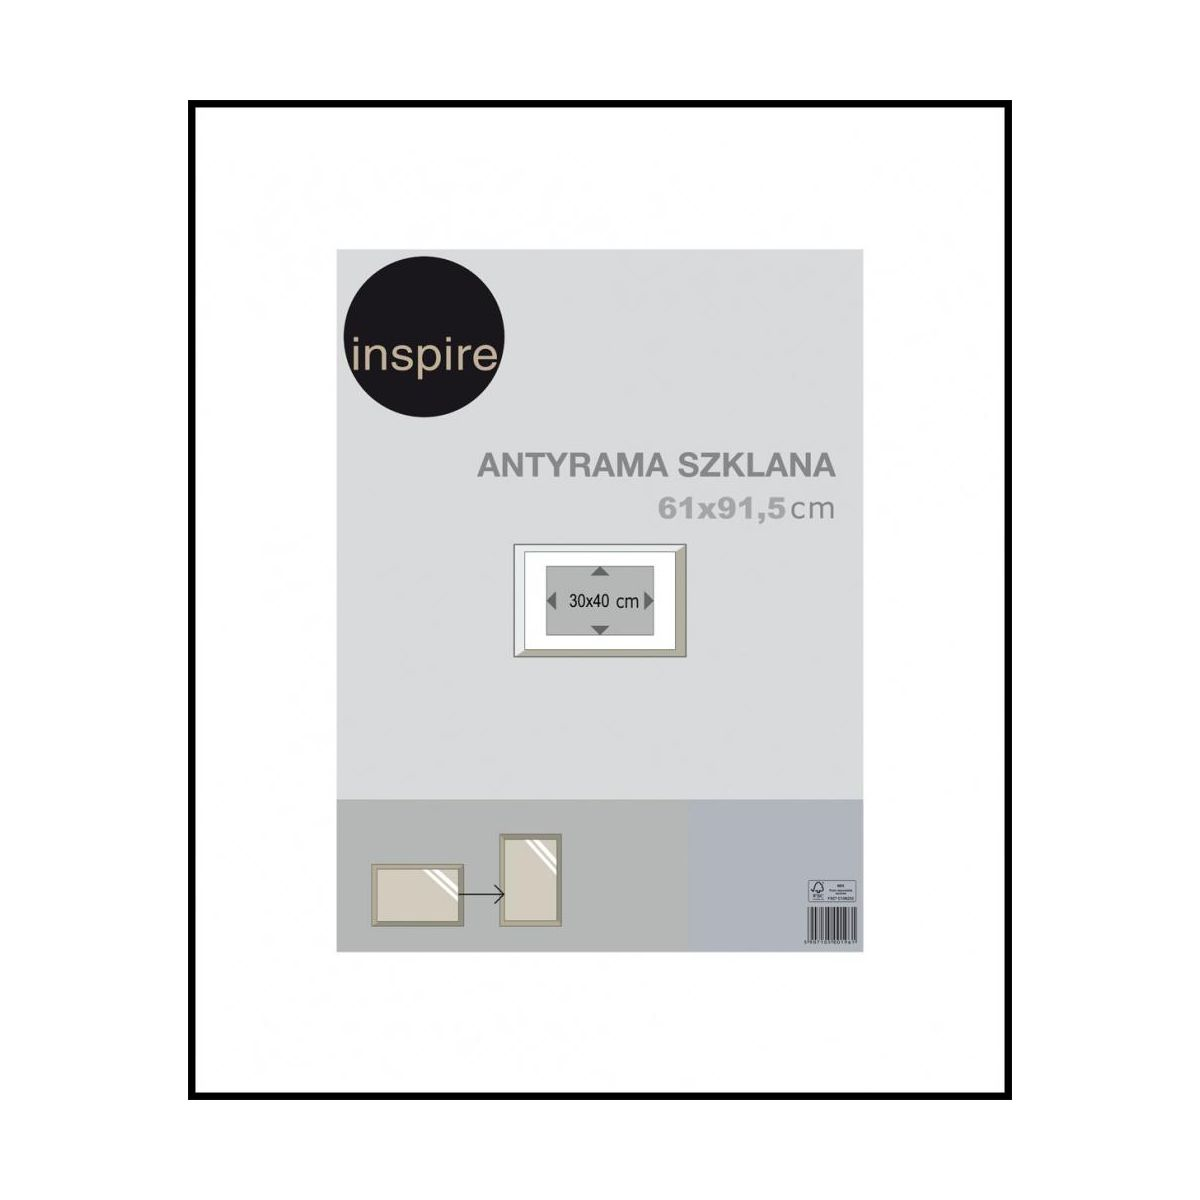 antyrama 61 91 5 inspire antyramy w atrakcyjnej cenie. Black Bedroom Furniture Sets. Home Design Ideas